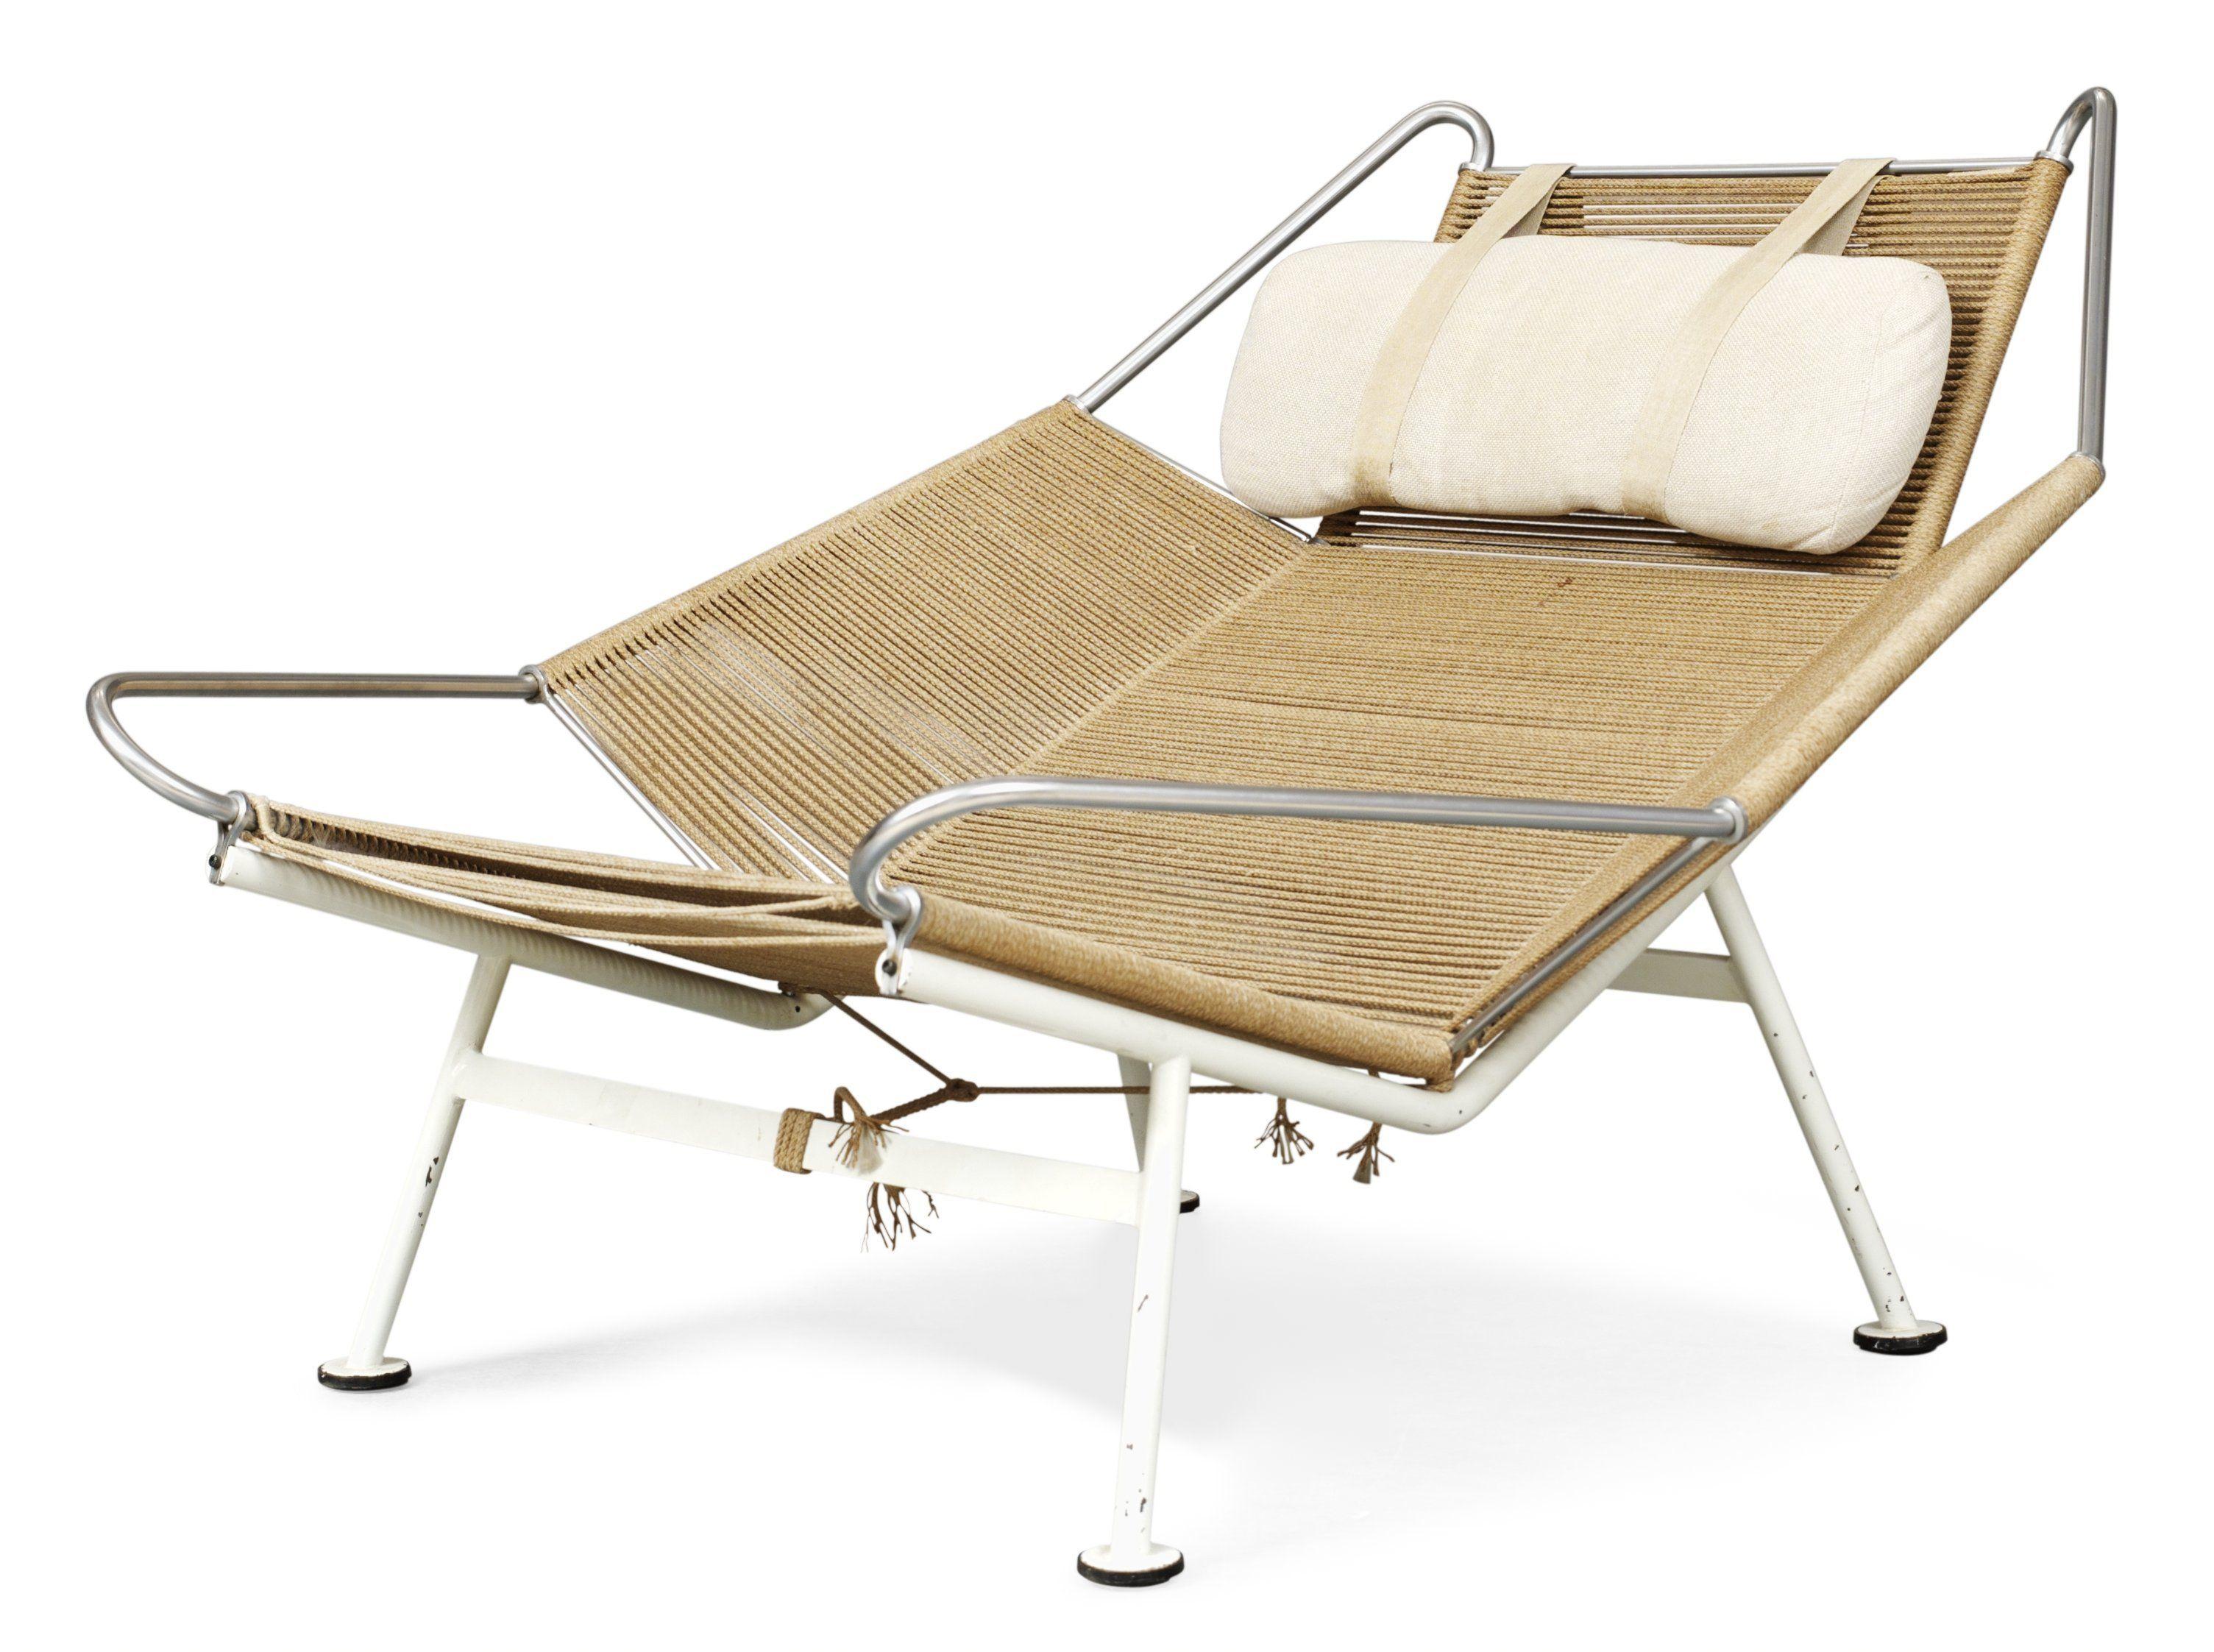 A Hans J Wegner Lounge Chair Flag Halyard By Getama Denmark Autumn Modern Sale 553 Bukowskis Mobeldesign Mobelideer Stoldesign